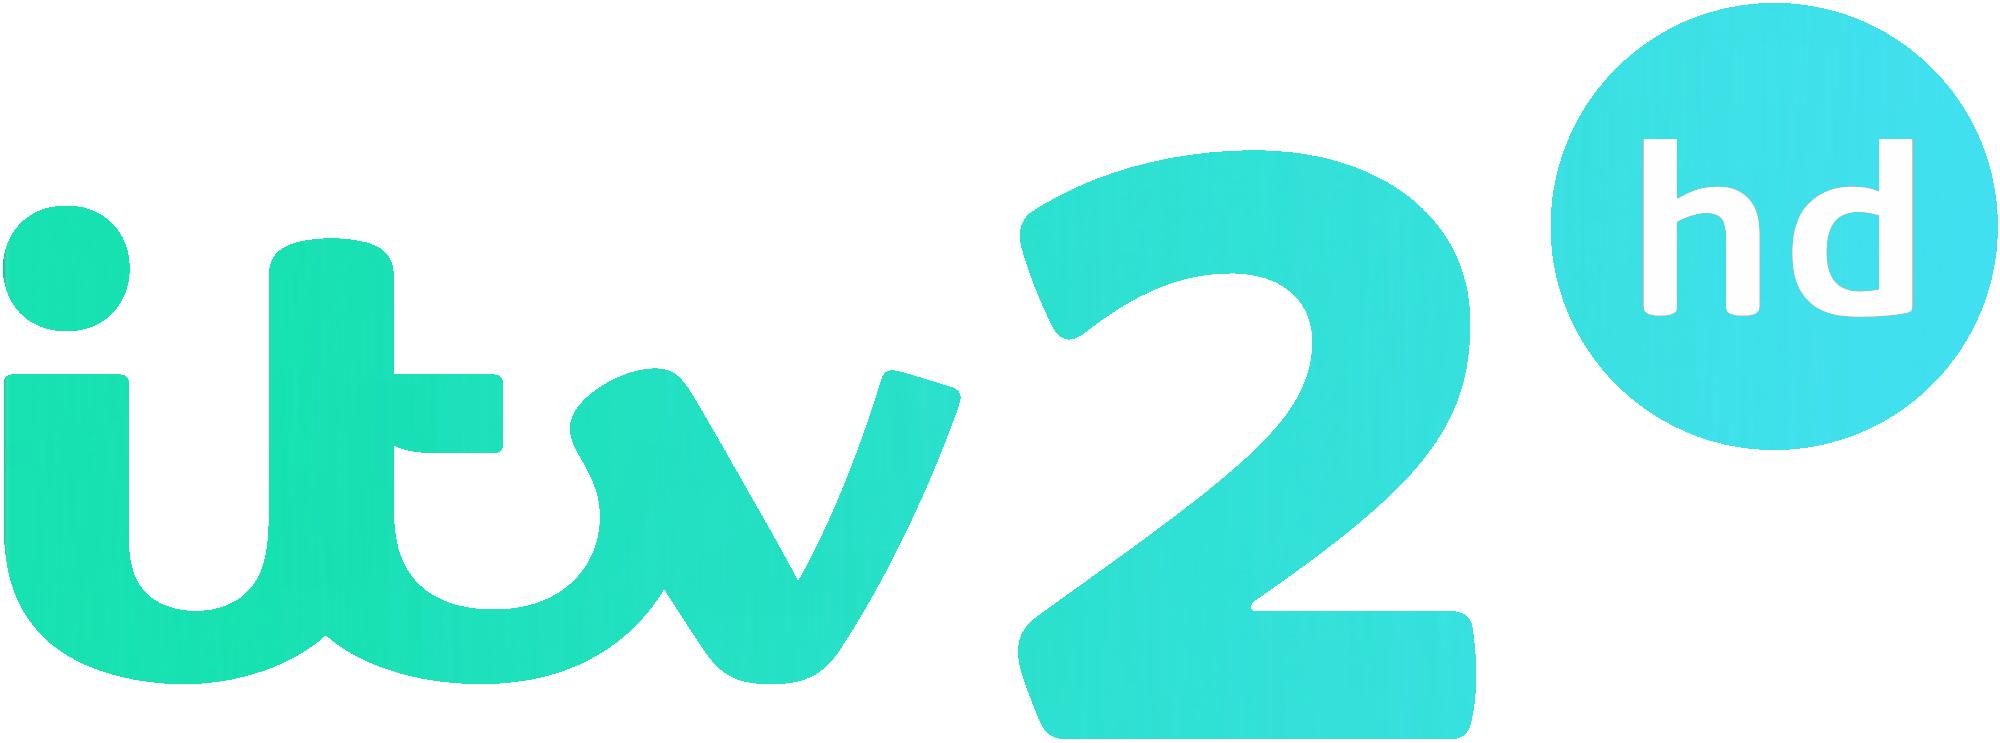 ITV2 HD 2015.png - Itv2 Hd PNG